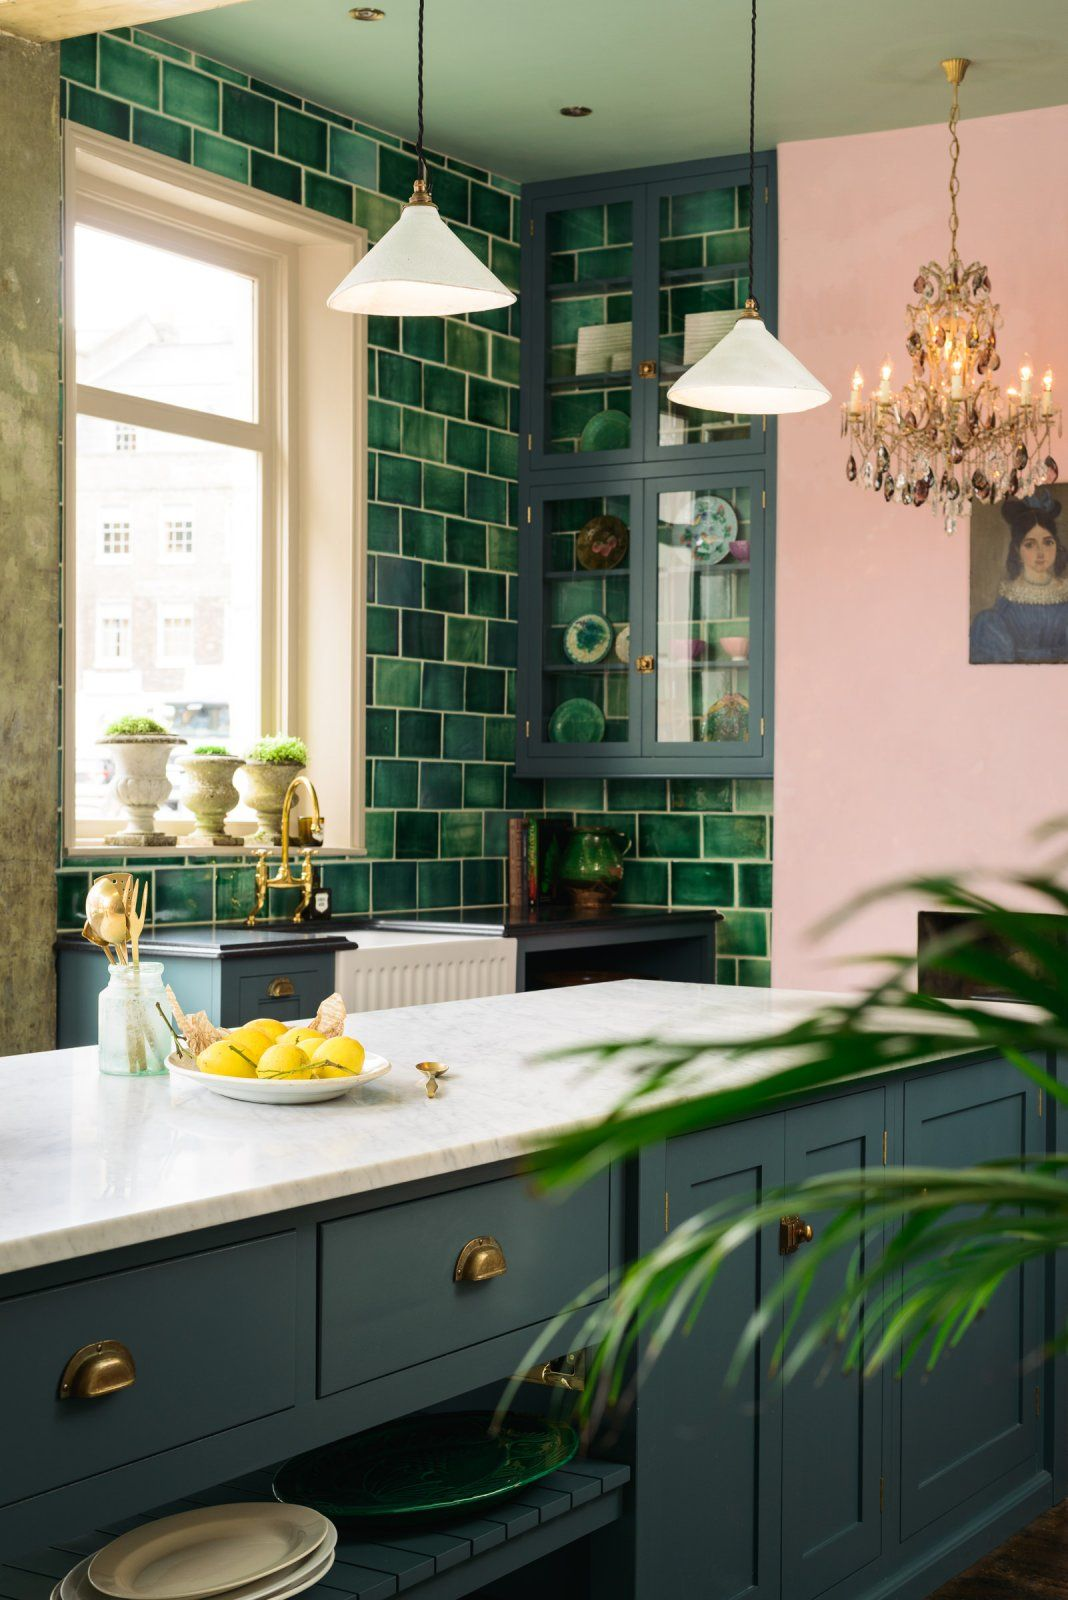 Design led furniture manufacturer deVOL just recently opened their